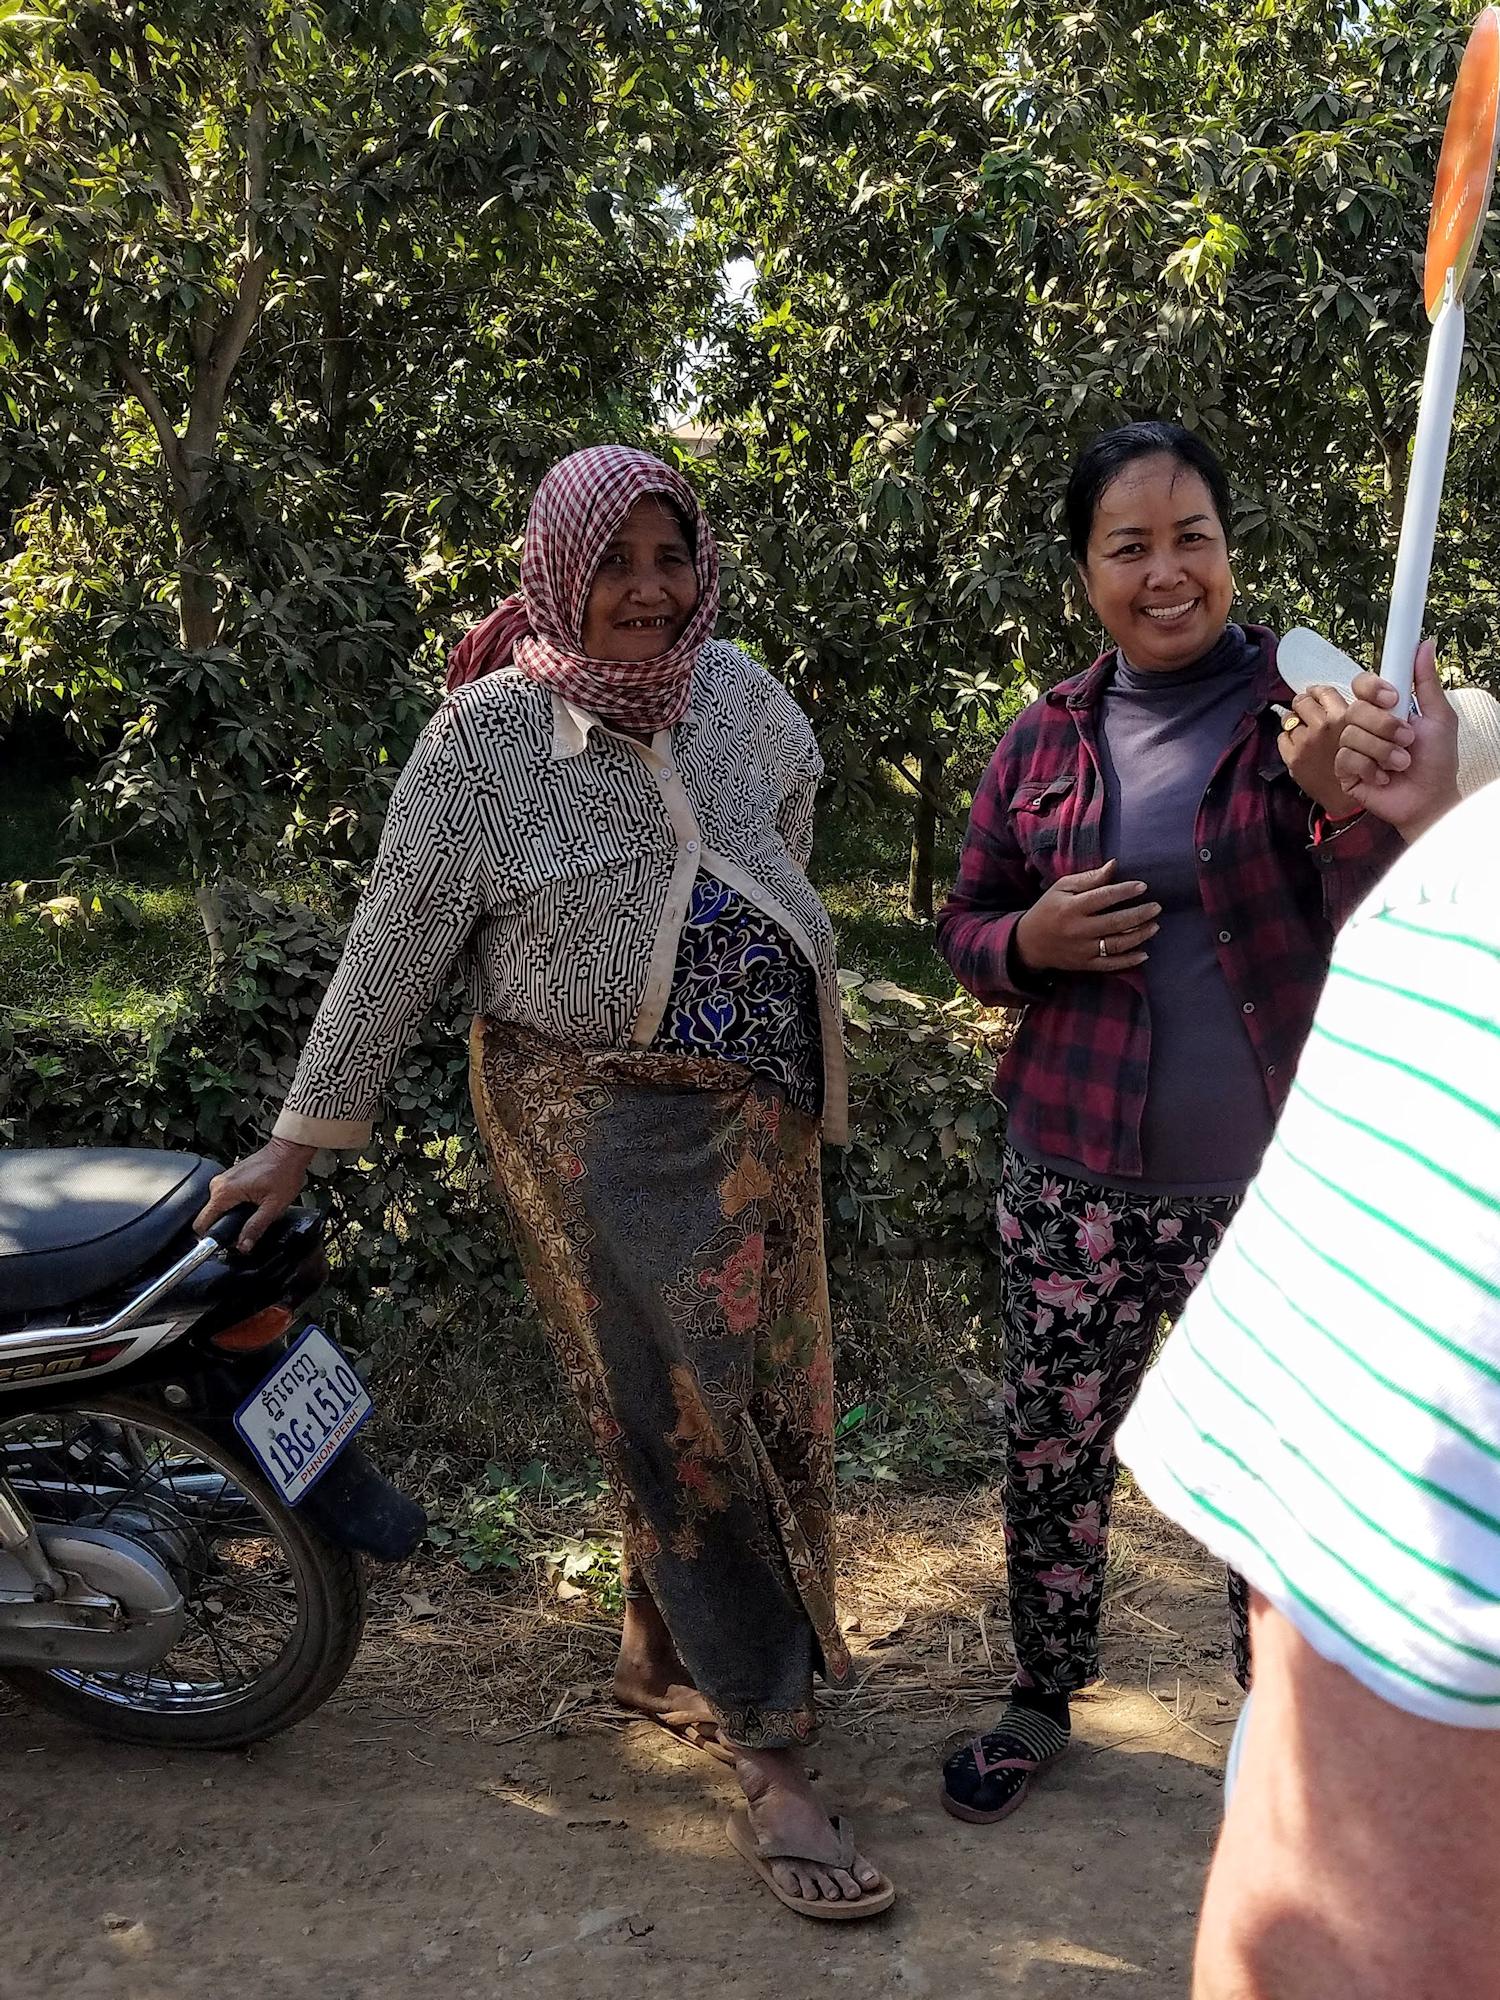 Ladies in the Village